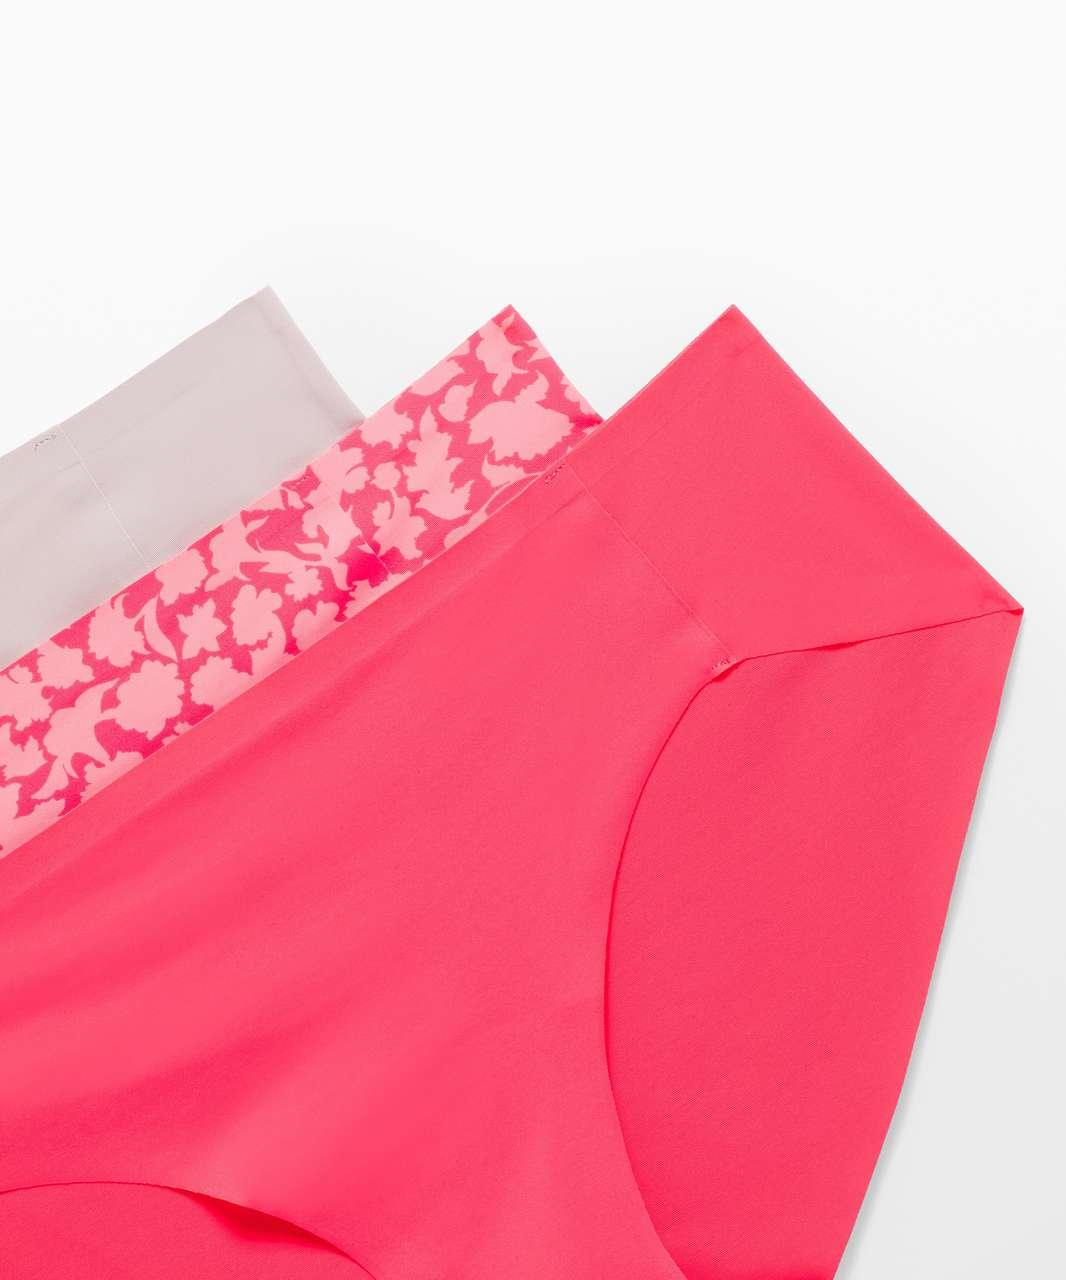 Lululemon Namastay Put Hipster 3 Pack - Heartthrob / Silhouette Floral Pink Lemonade Heartthrob / Smoky Blush